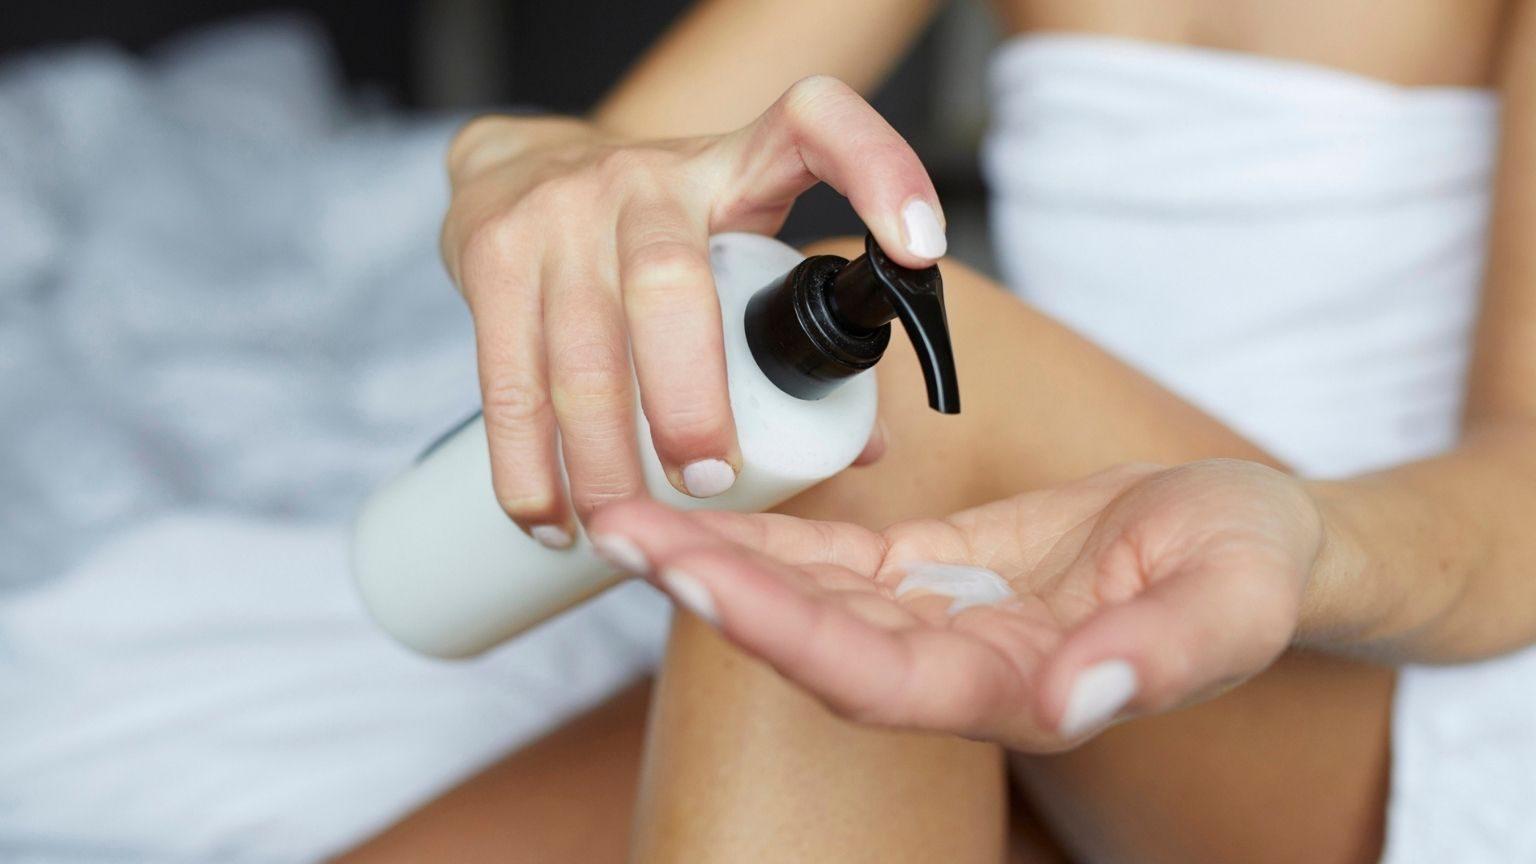 Young woman putting moisturiser